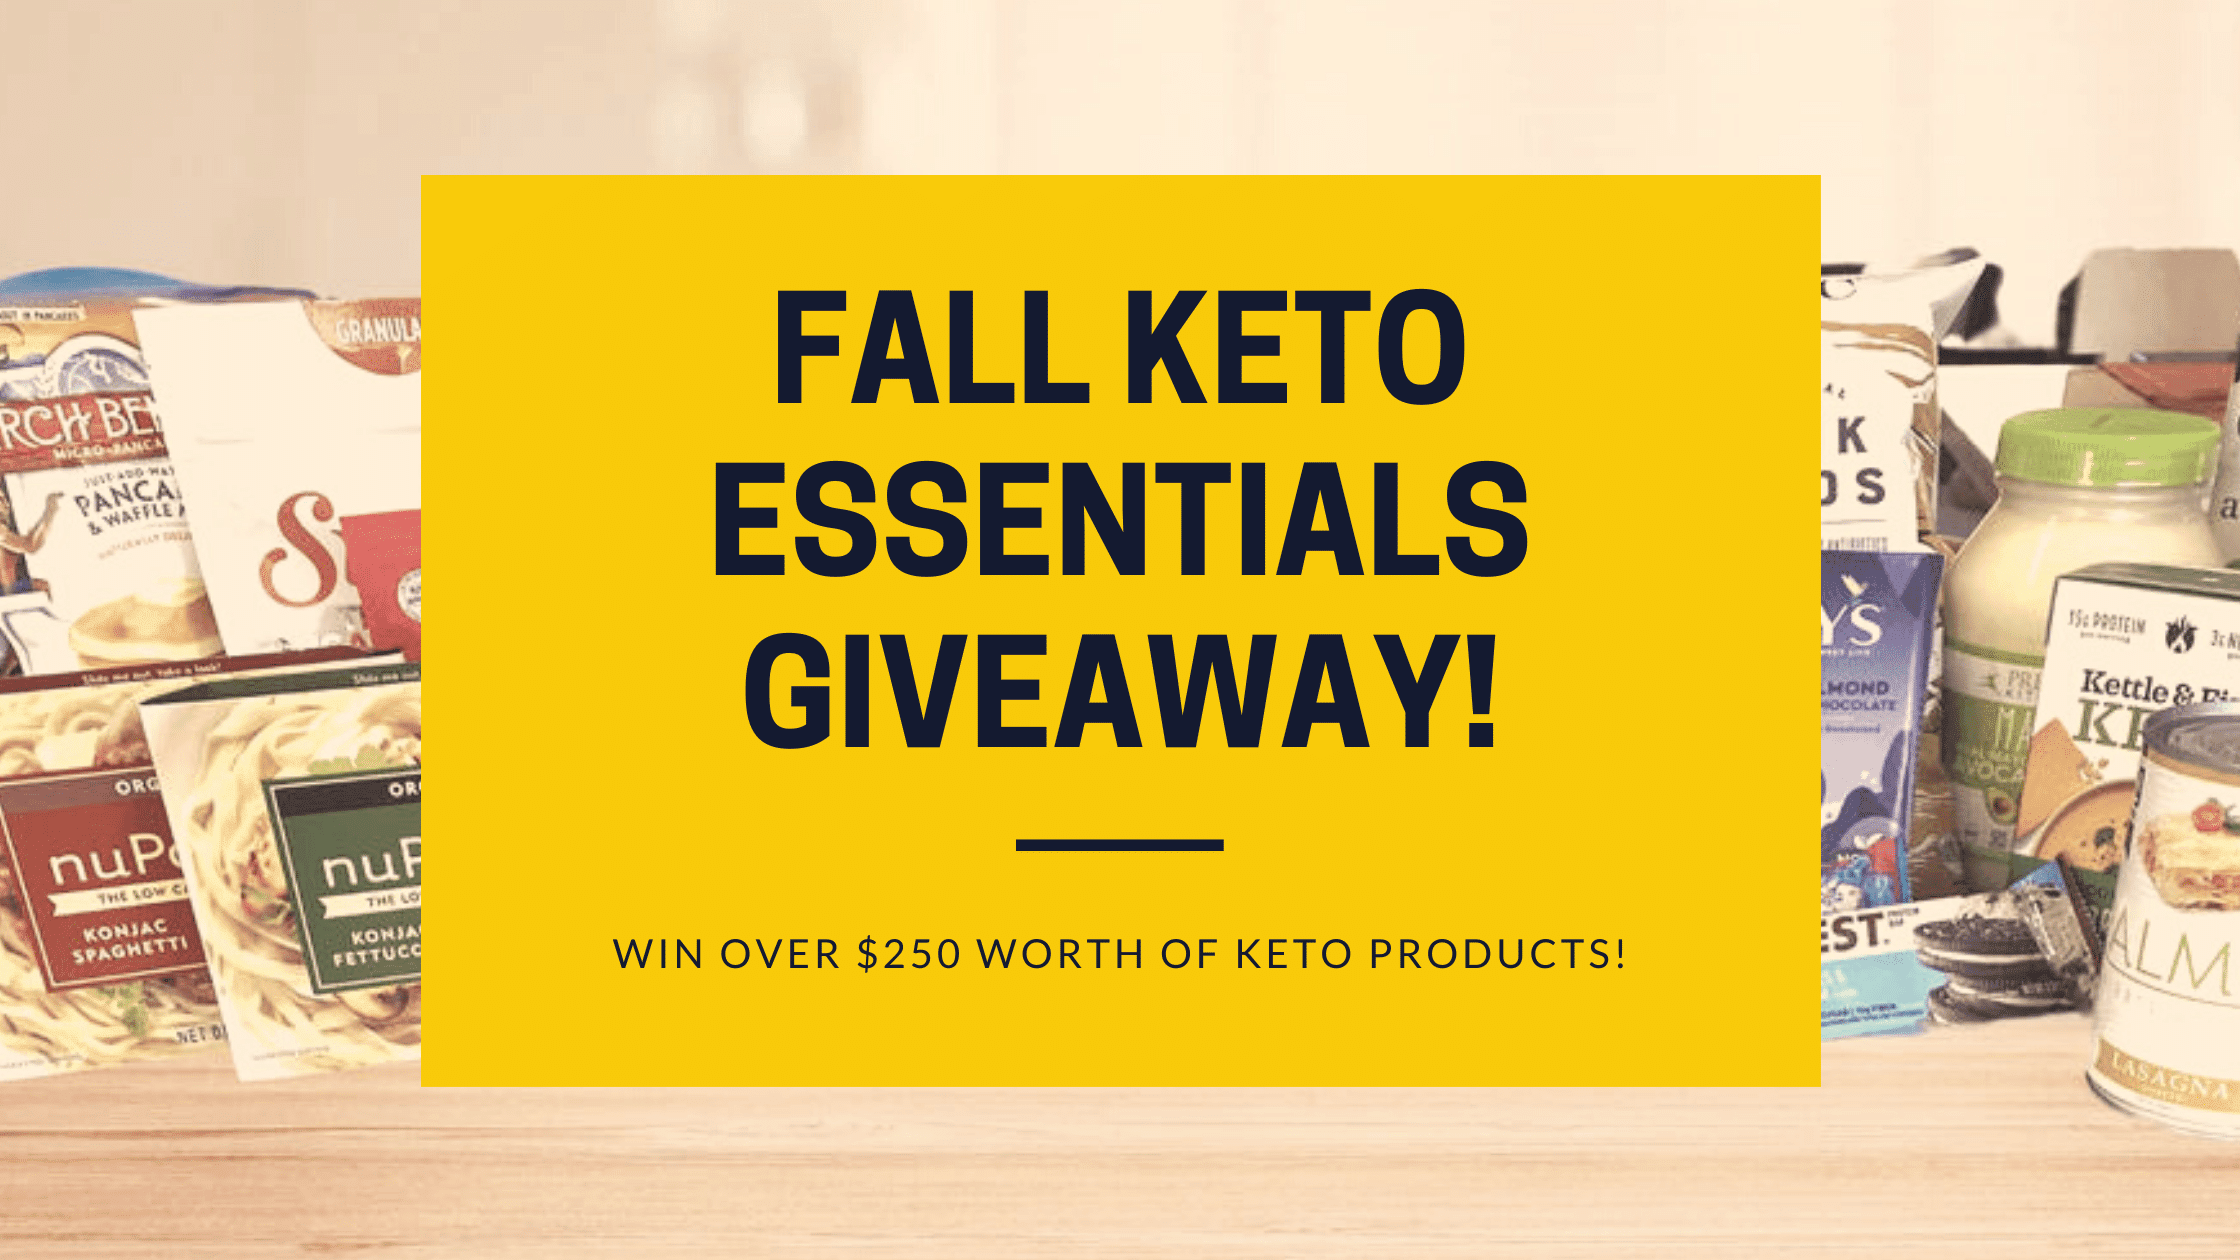 Fall Keto Giveaway